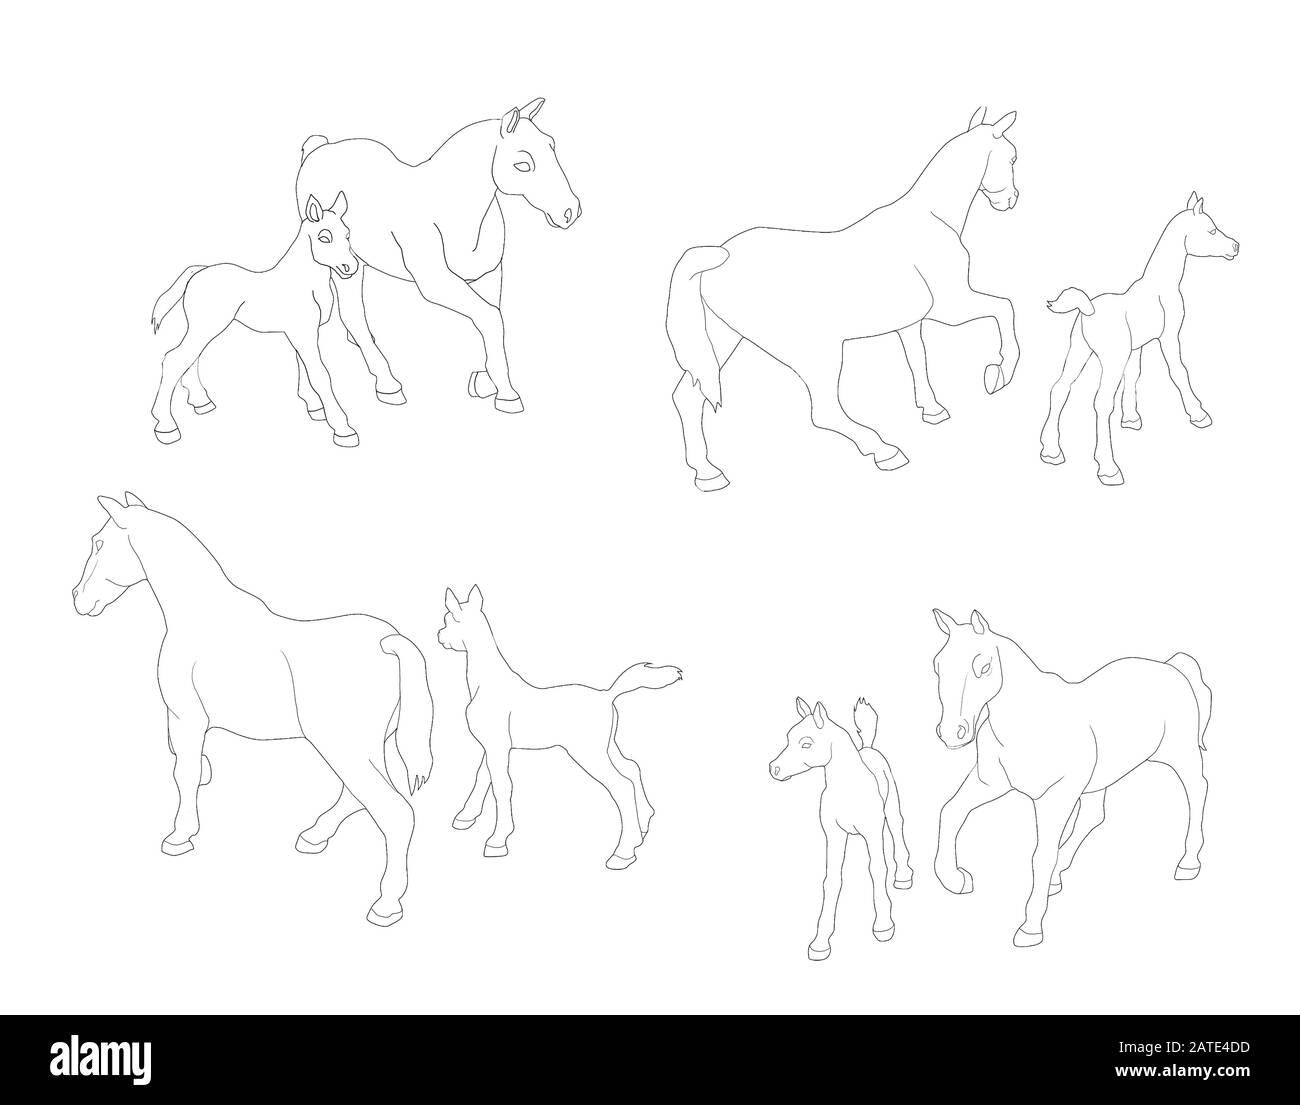 Horse Illustration Realistic Drawing Design Stock Photo Alamy